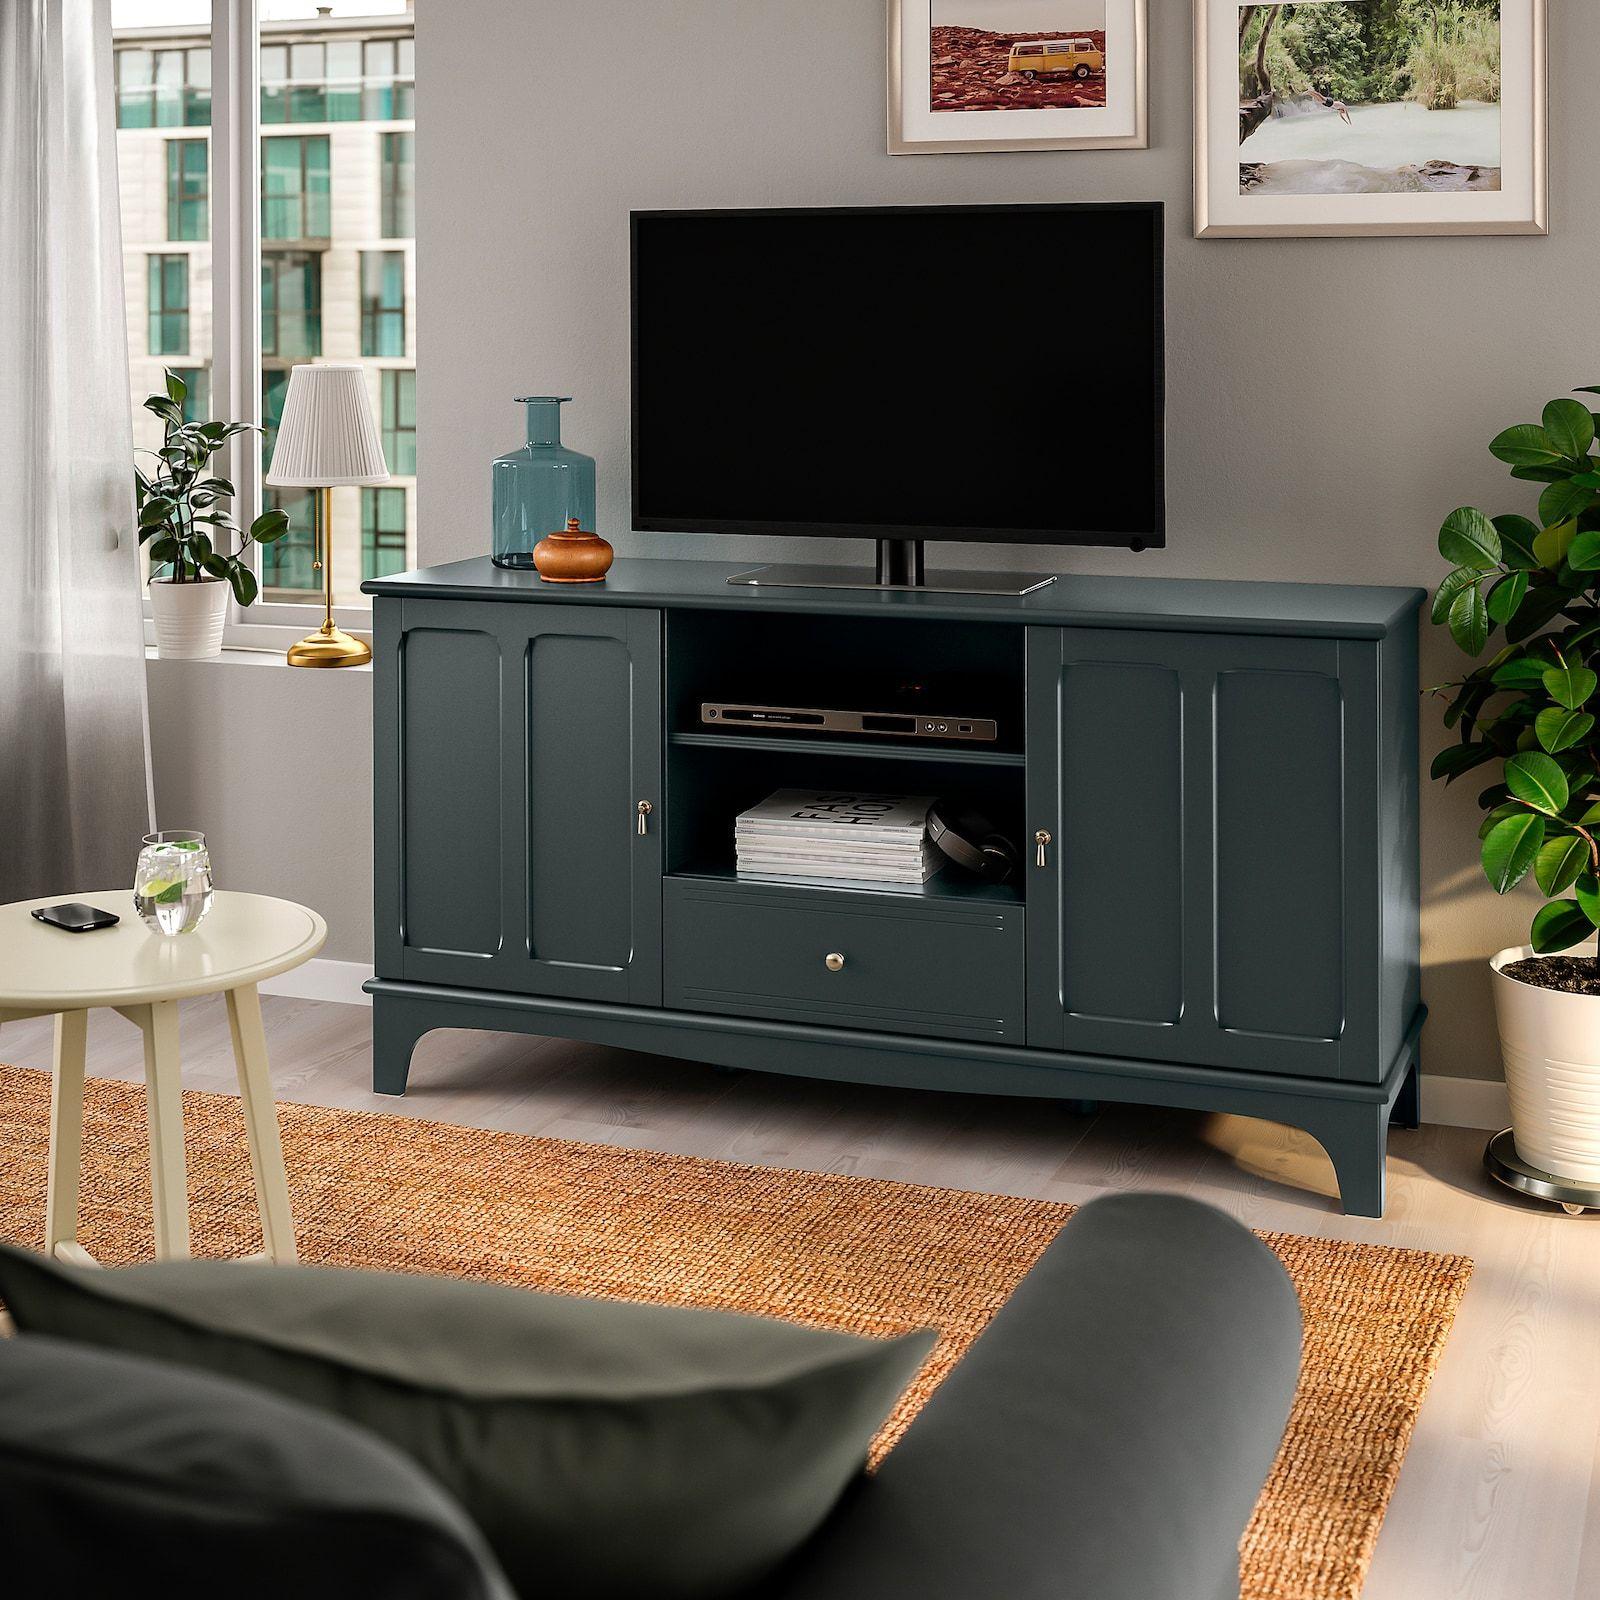 Lommarp Dark Blue Green Tv Bench 159x45x81 Cm Ikea Tv Bench Tv Unit Dark Blue Green